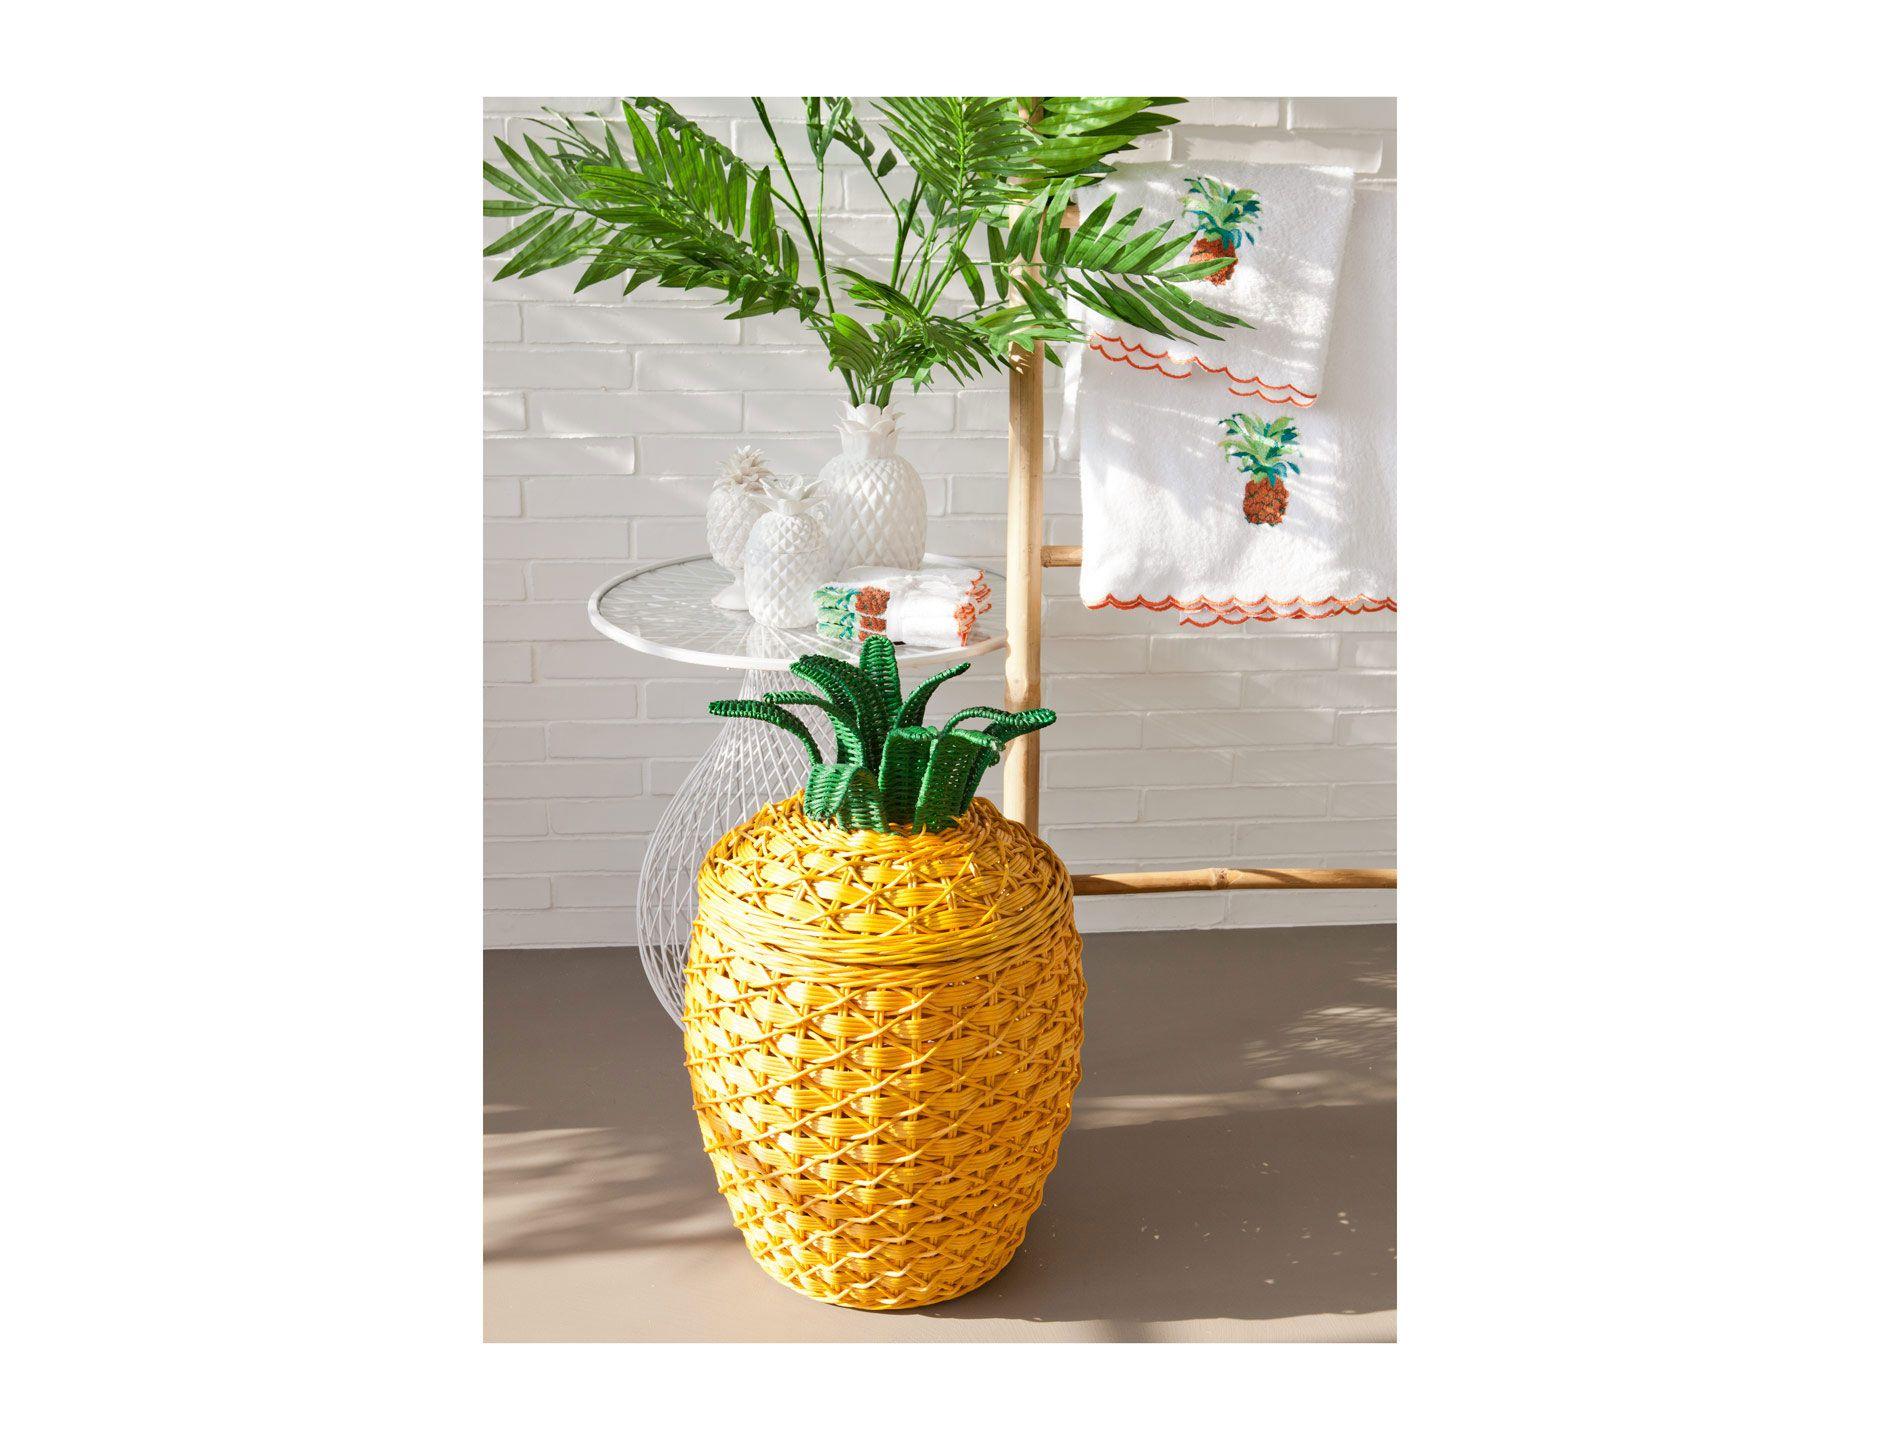 LookBook   Ananas dekor, Zara home, Wunschliste